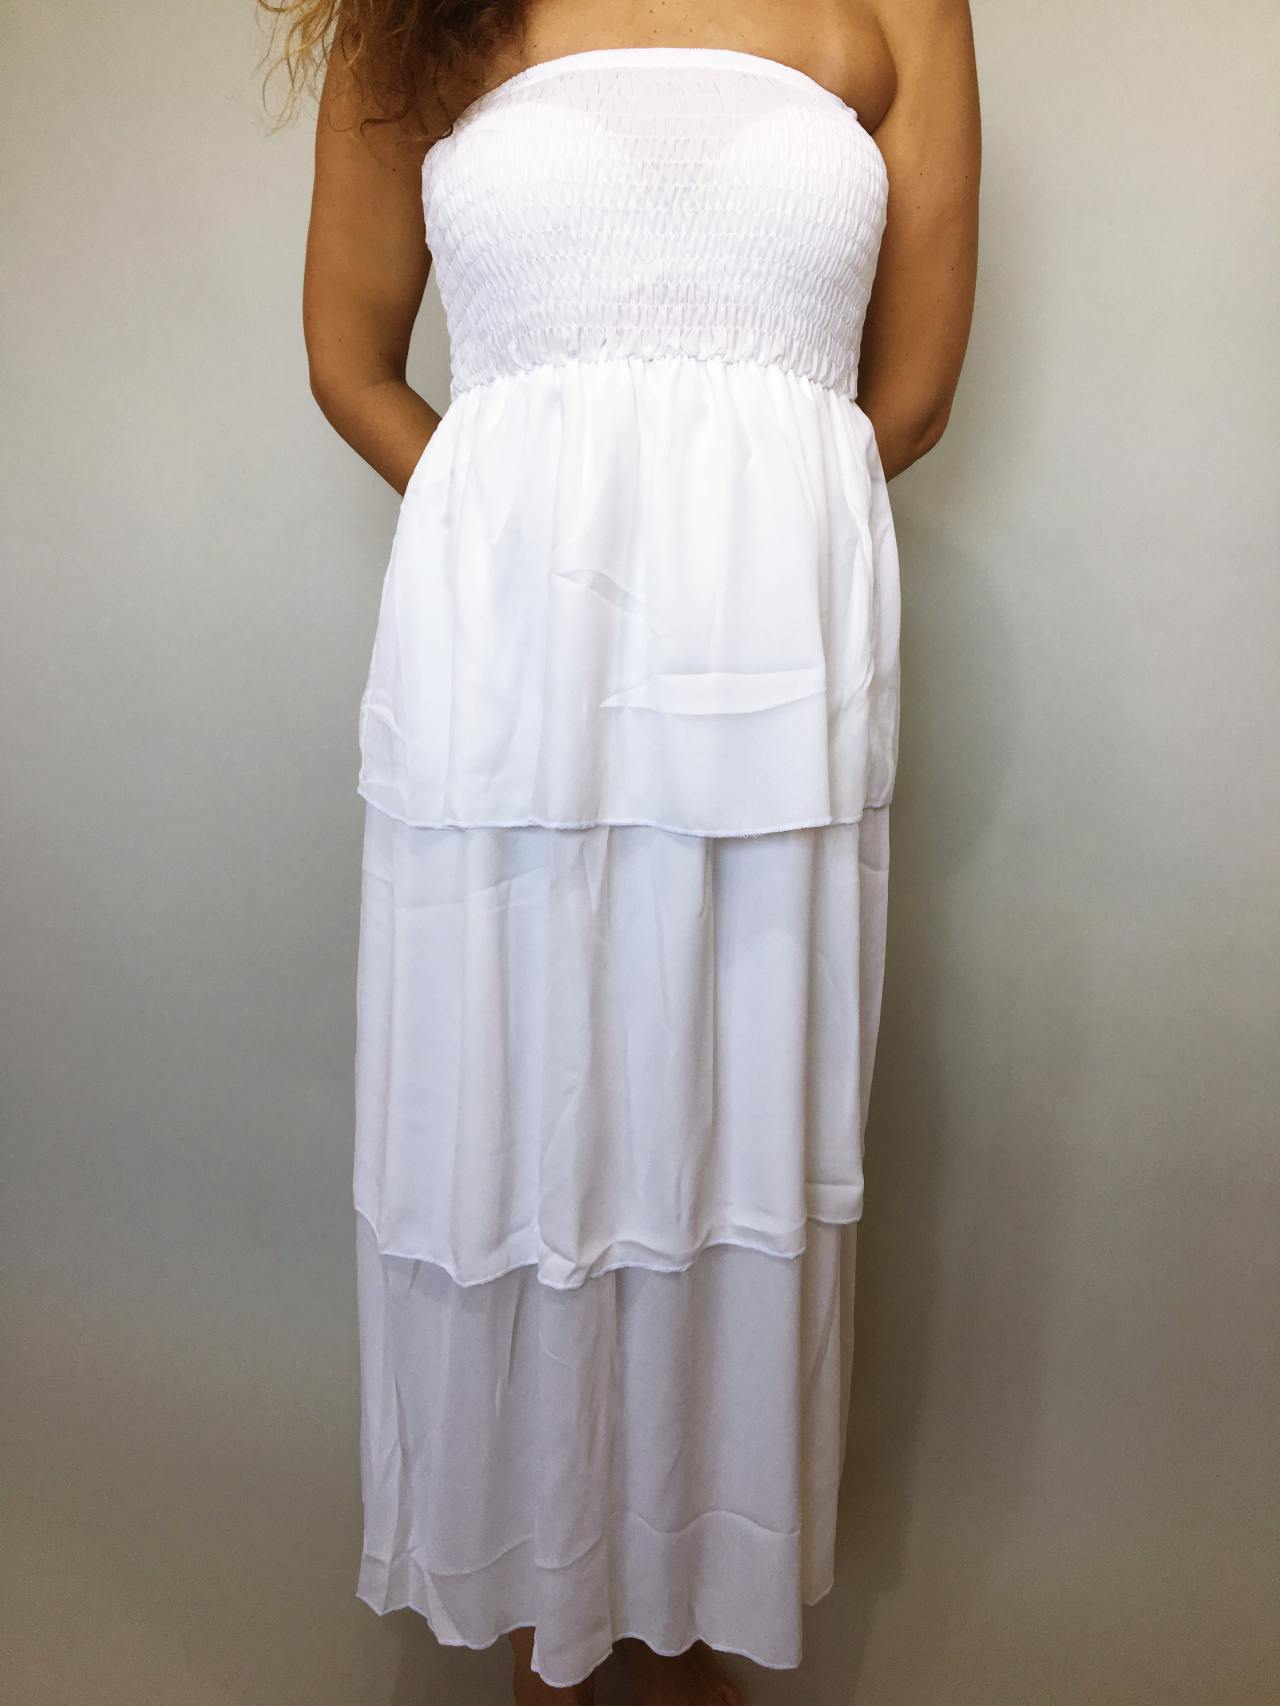 Šaty Summer Day bílé 02